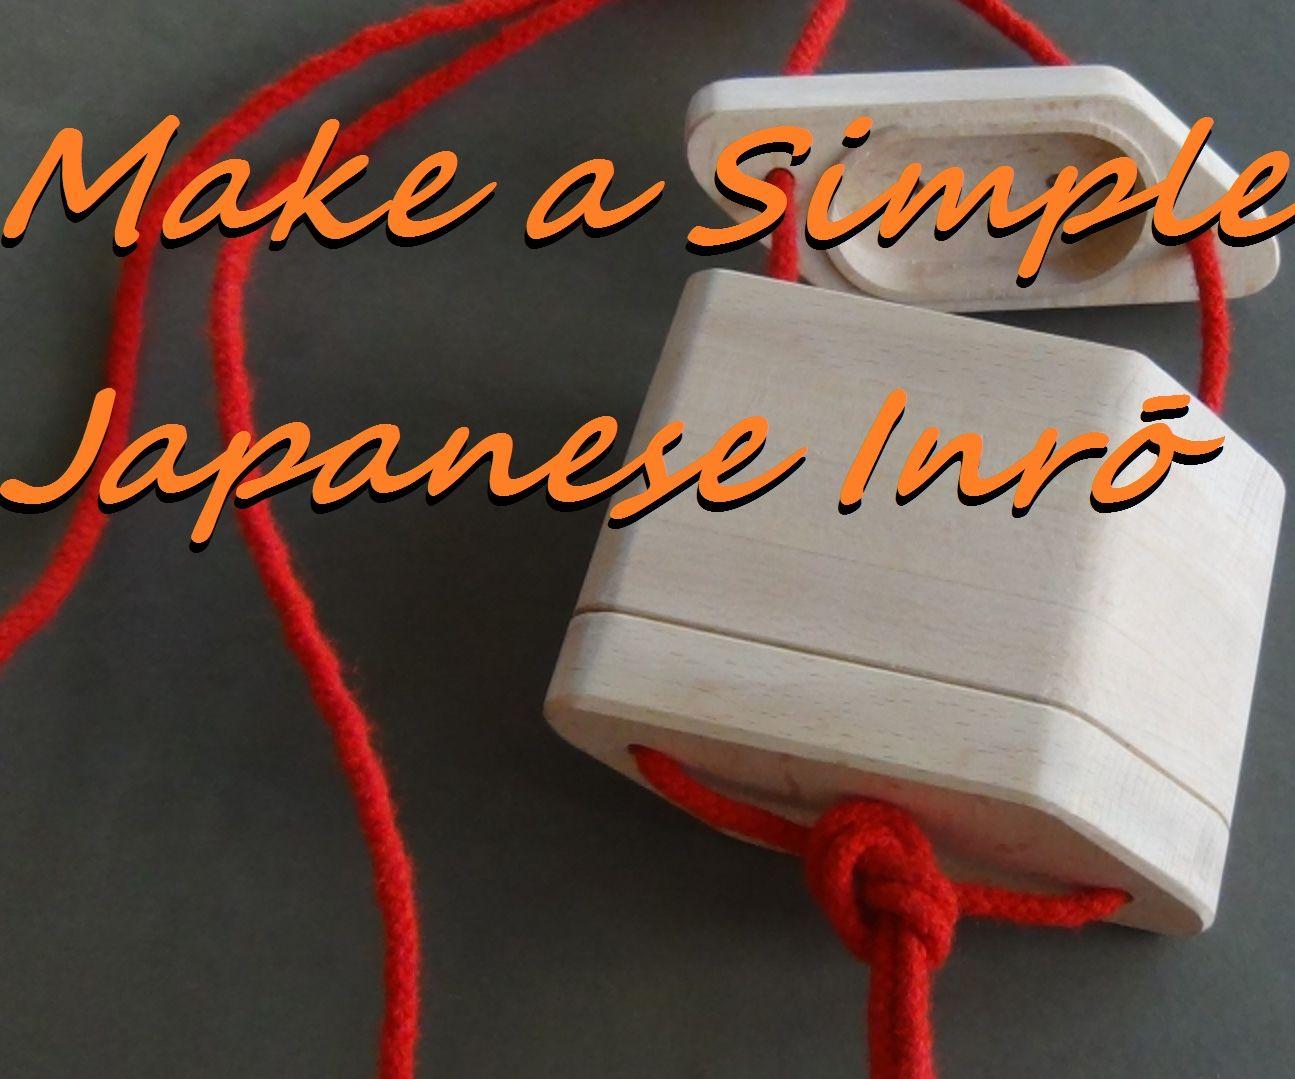 Make a Simple Inrō